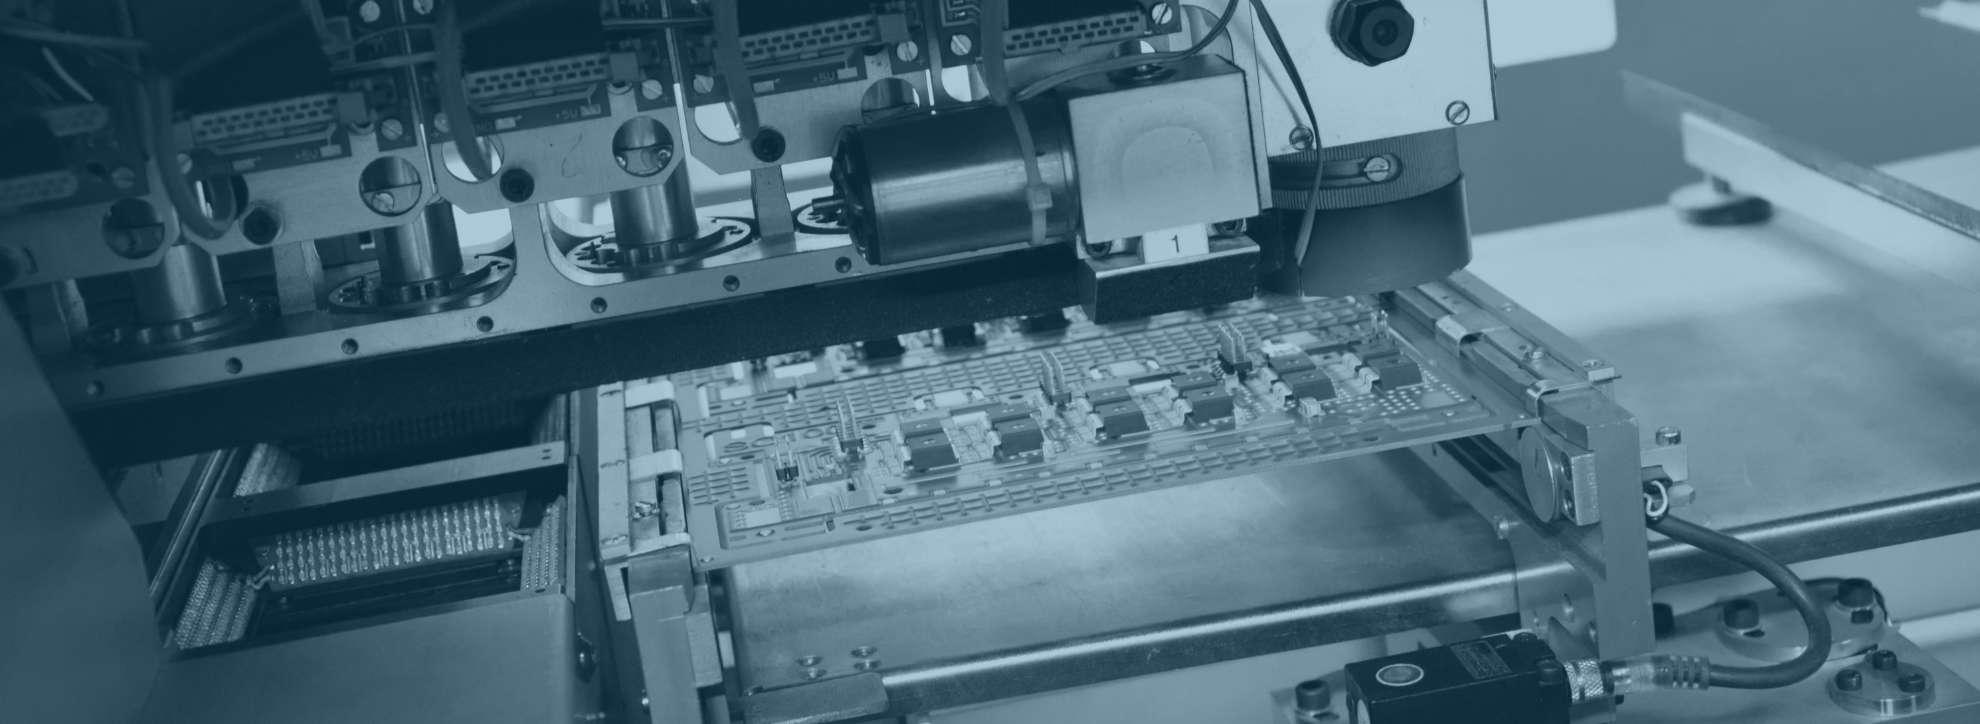 Mimot Bestückungsautomaten smd Leiterplatten bei Esysco SMD-Bestückung